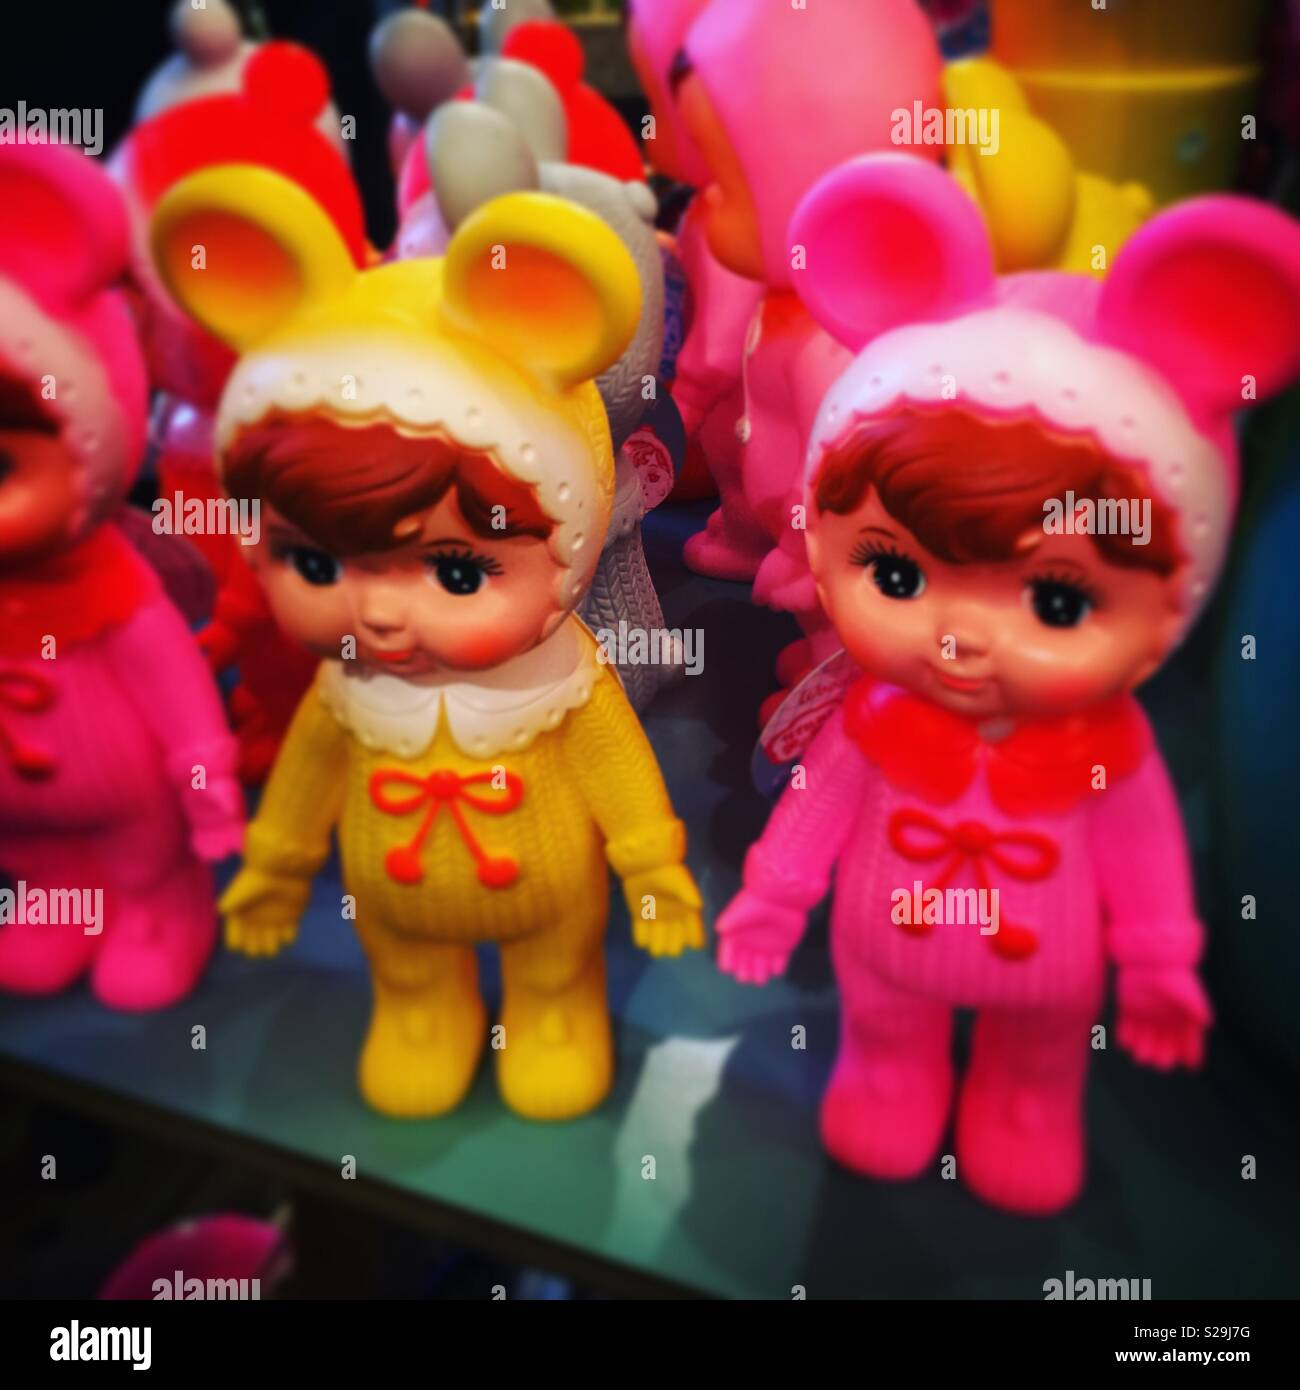 Kitsch retro plastic dolls - Stock Image